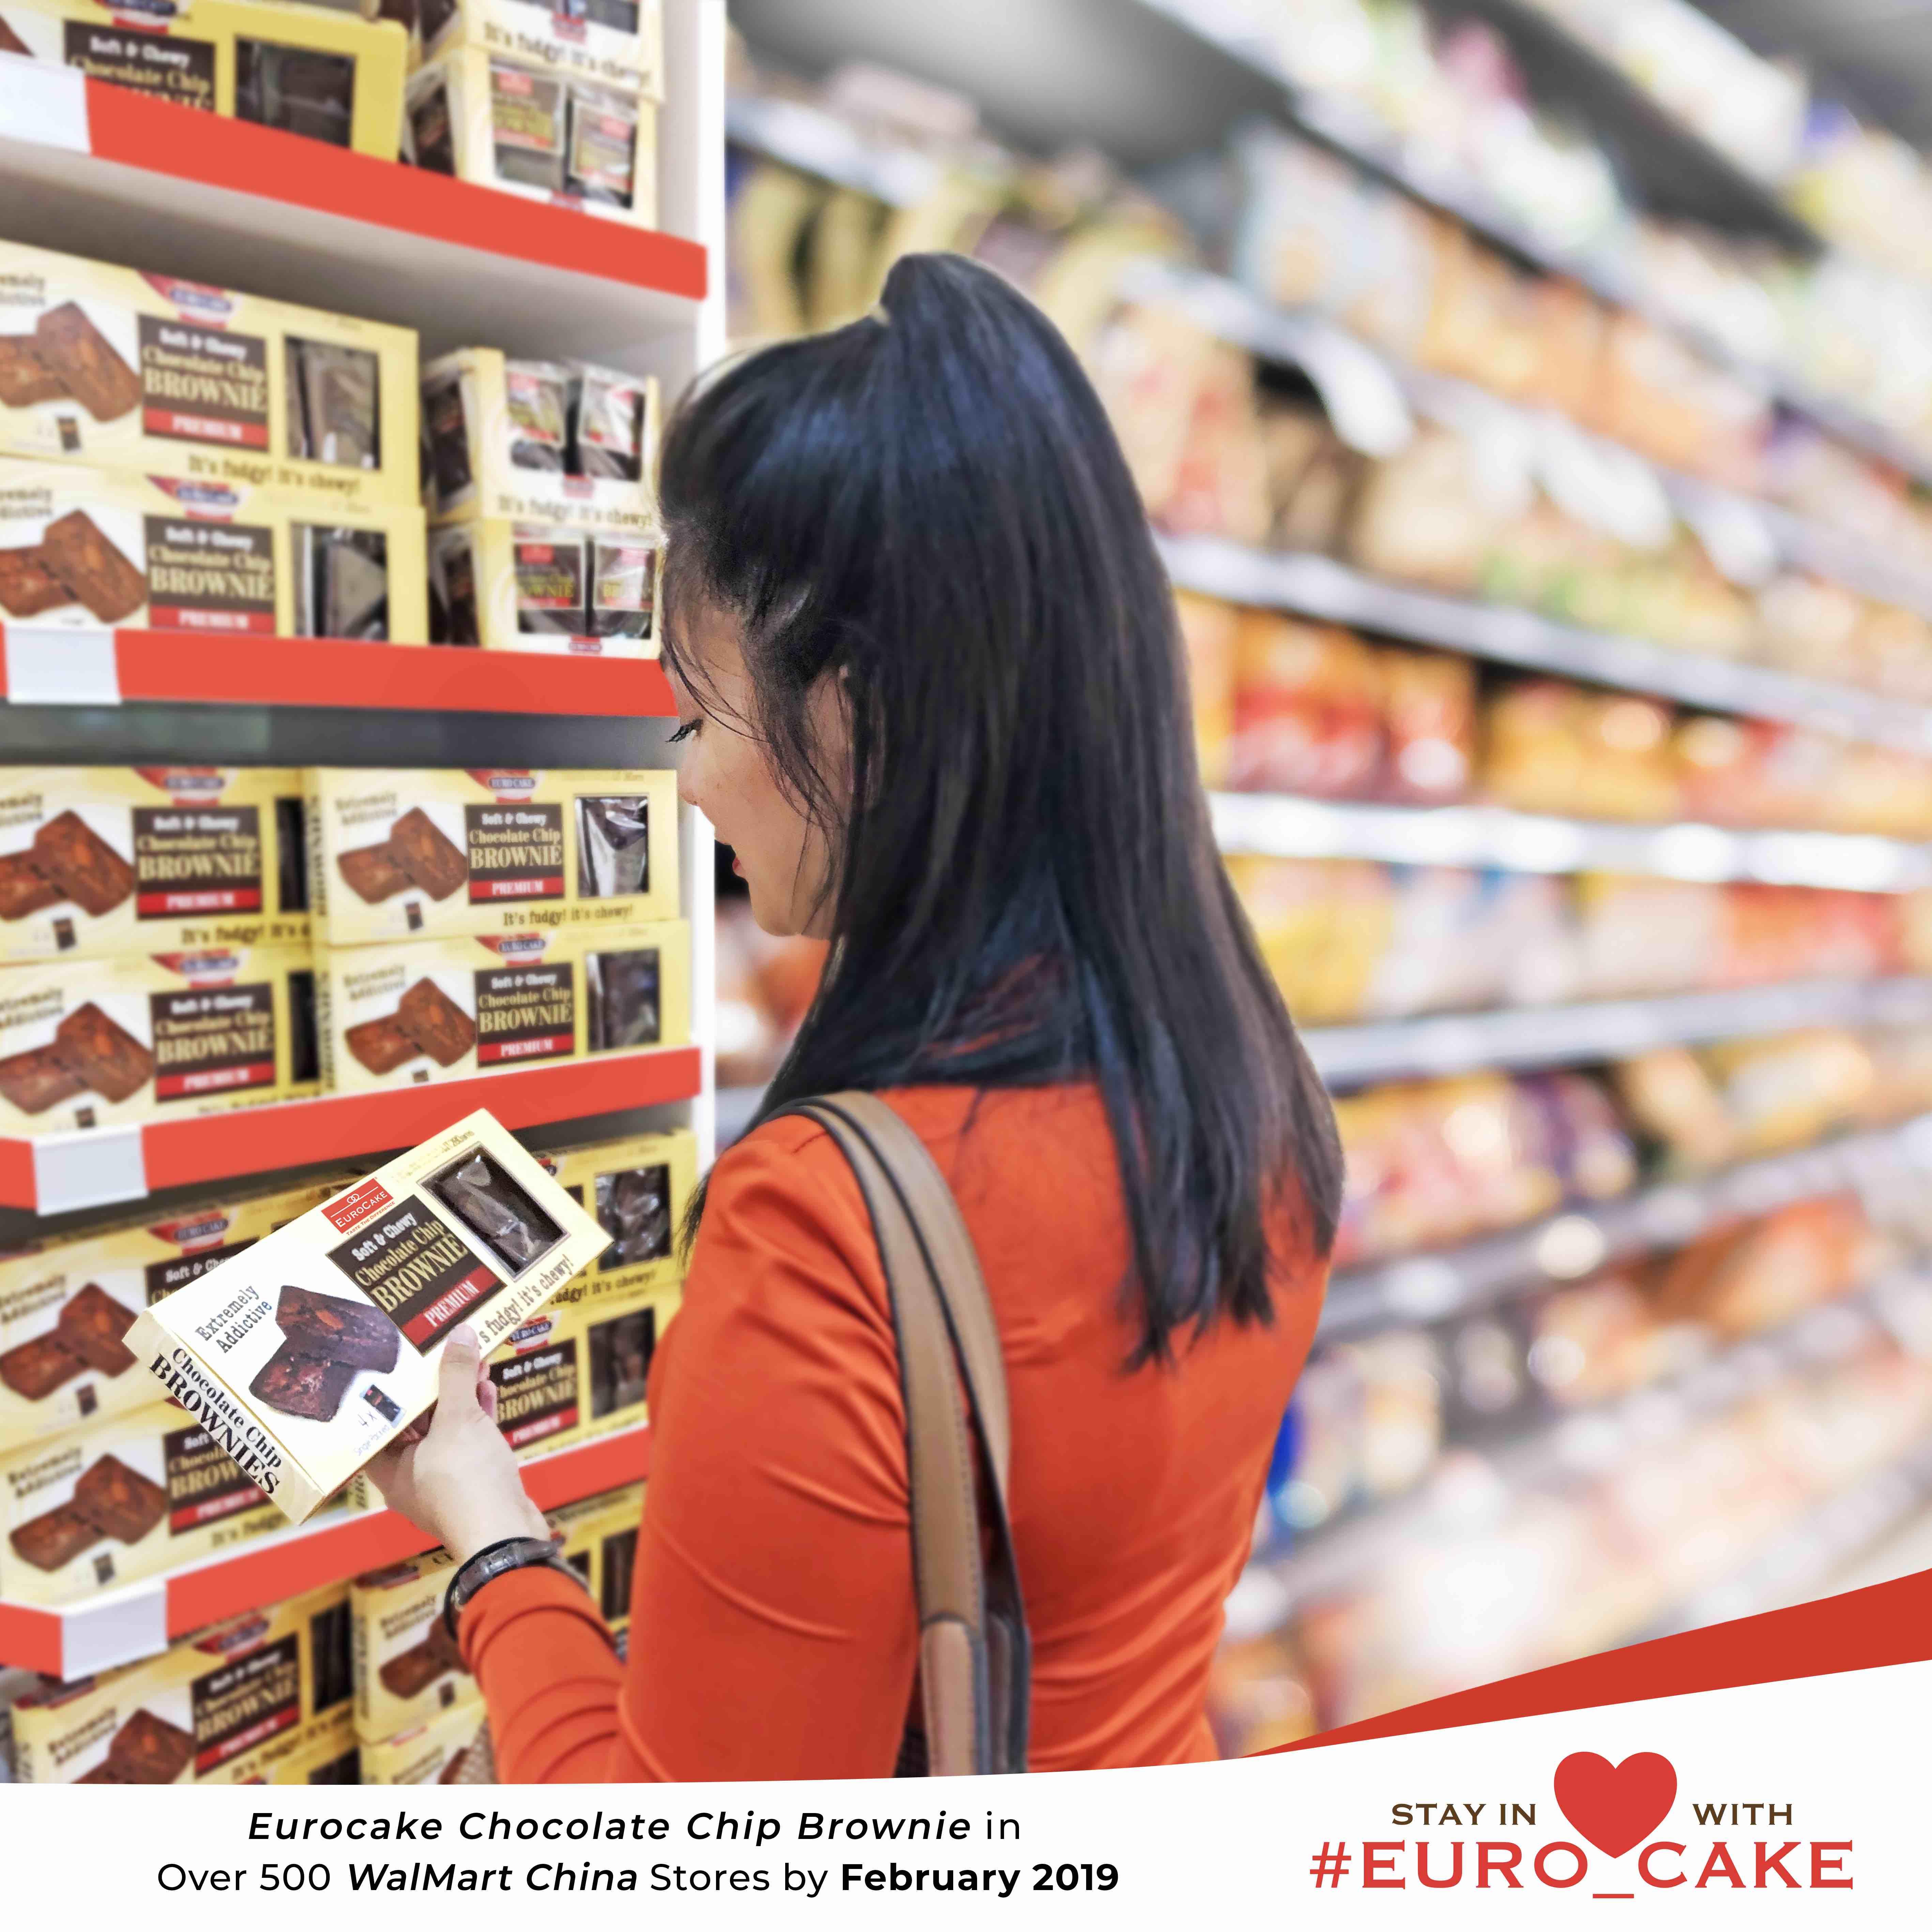 Dofreeze LLC Announces Availability of Best-Selling Eurocake